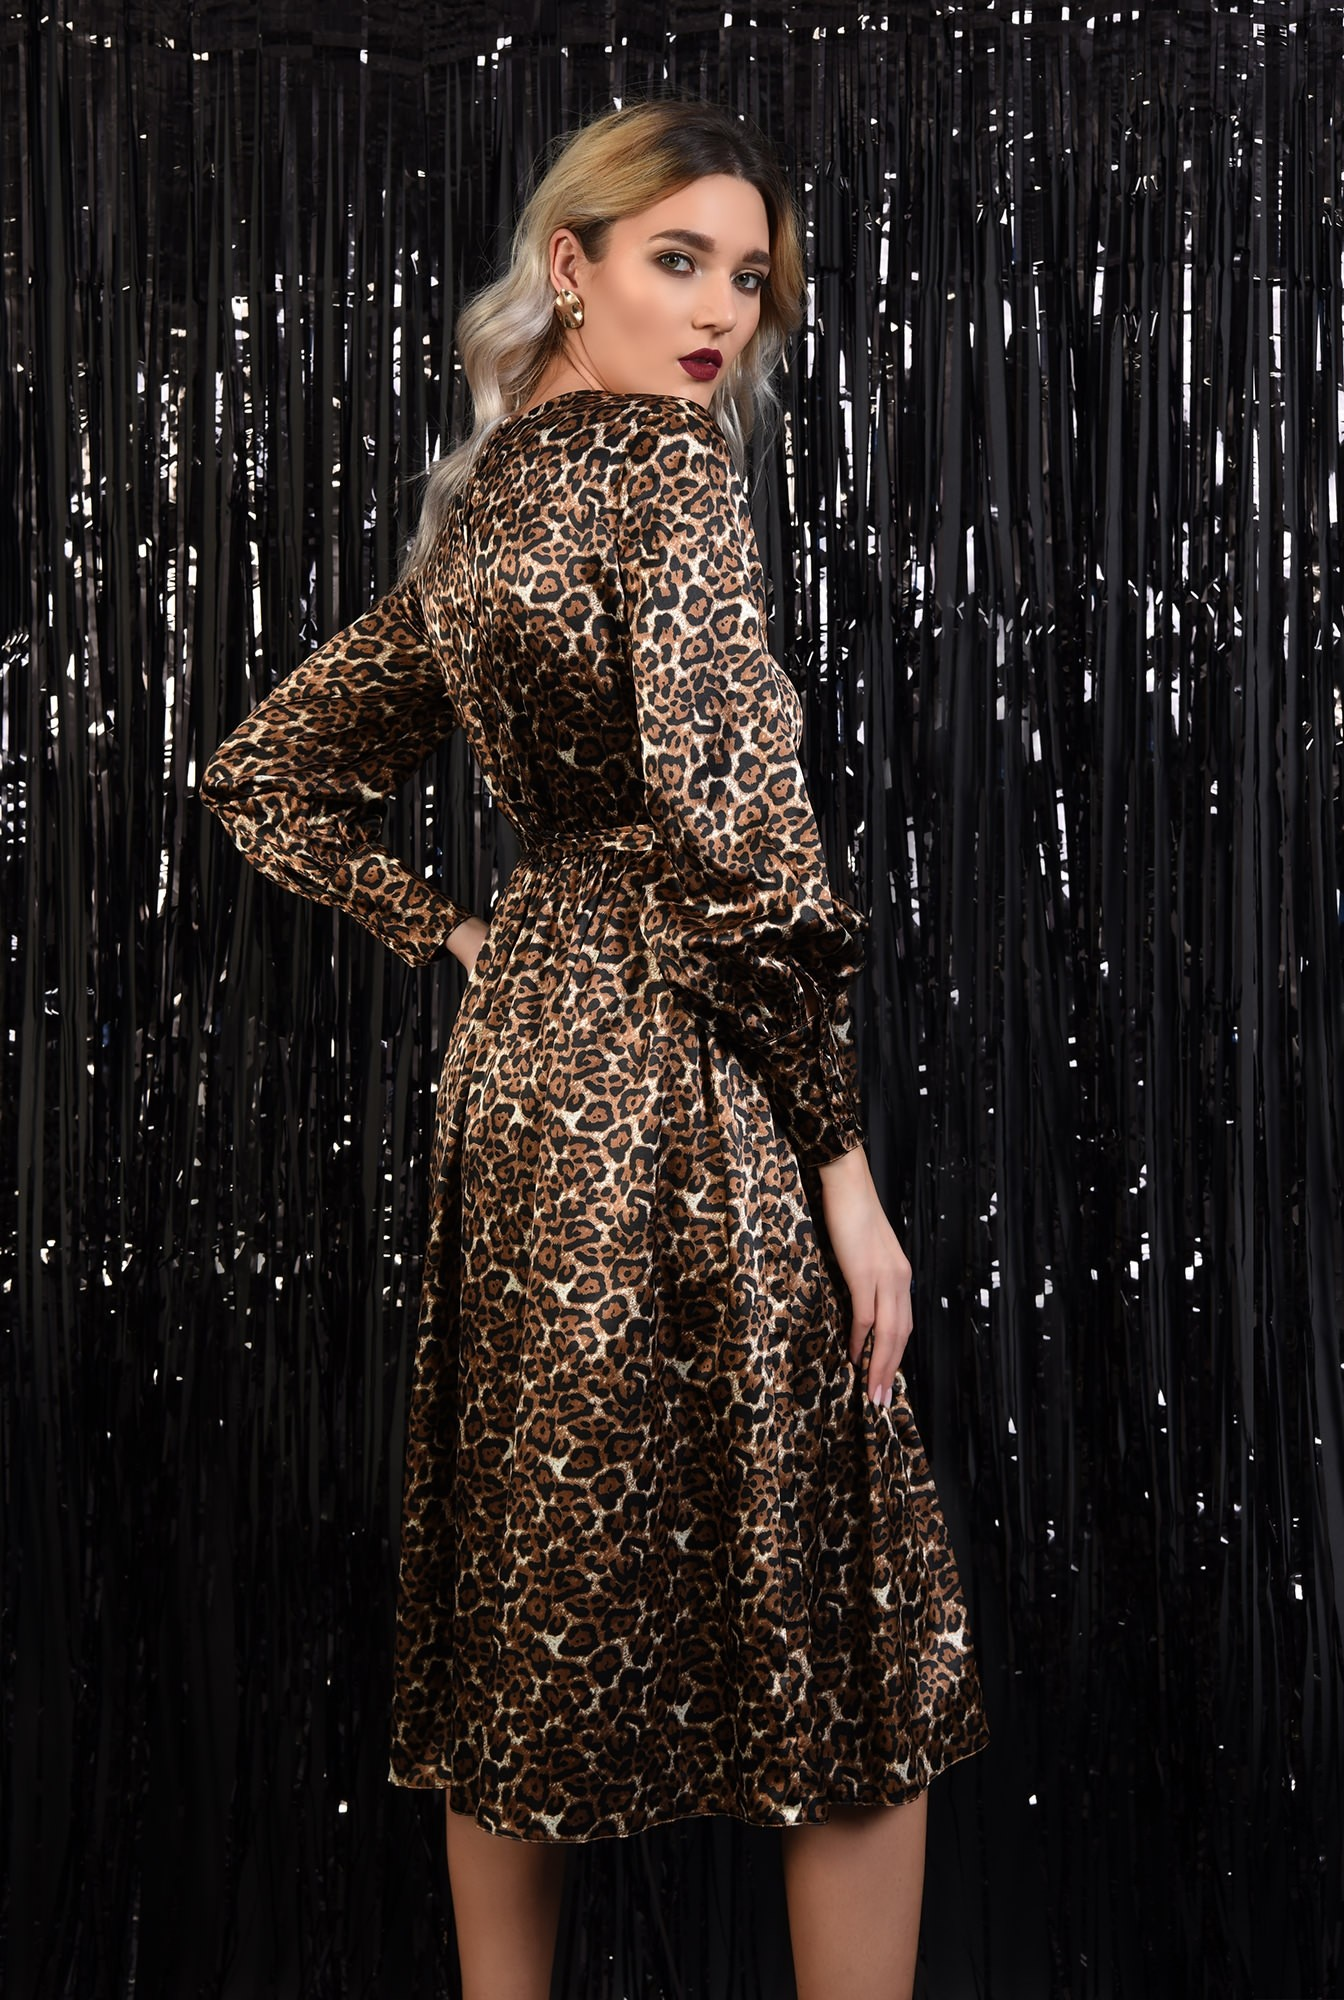 1 - 360 - rochie eleganta, din satin, animal print, nasturi la spate, evazata